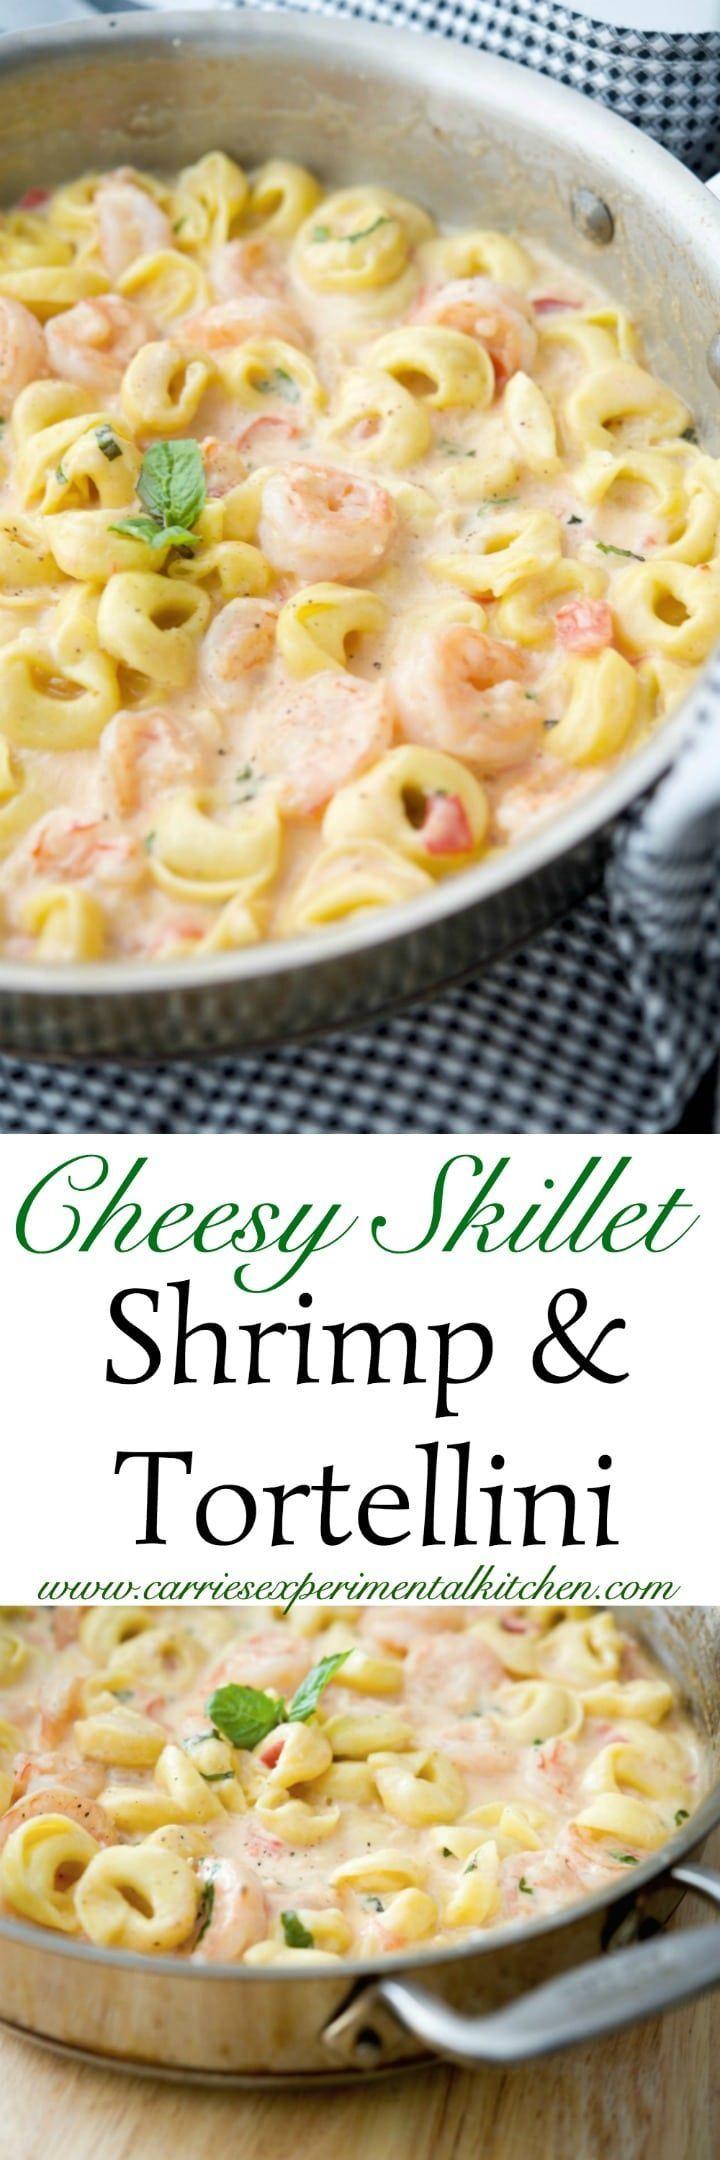 Cheesy Skillet Shrimp & Tortellini made with jumbo shrimp combined with cheese tortellini in a cheesy tomato basil Alfredo sauce.